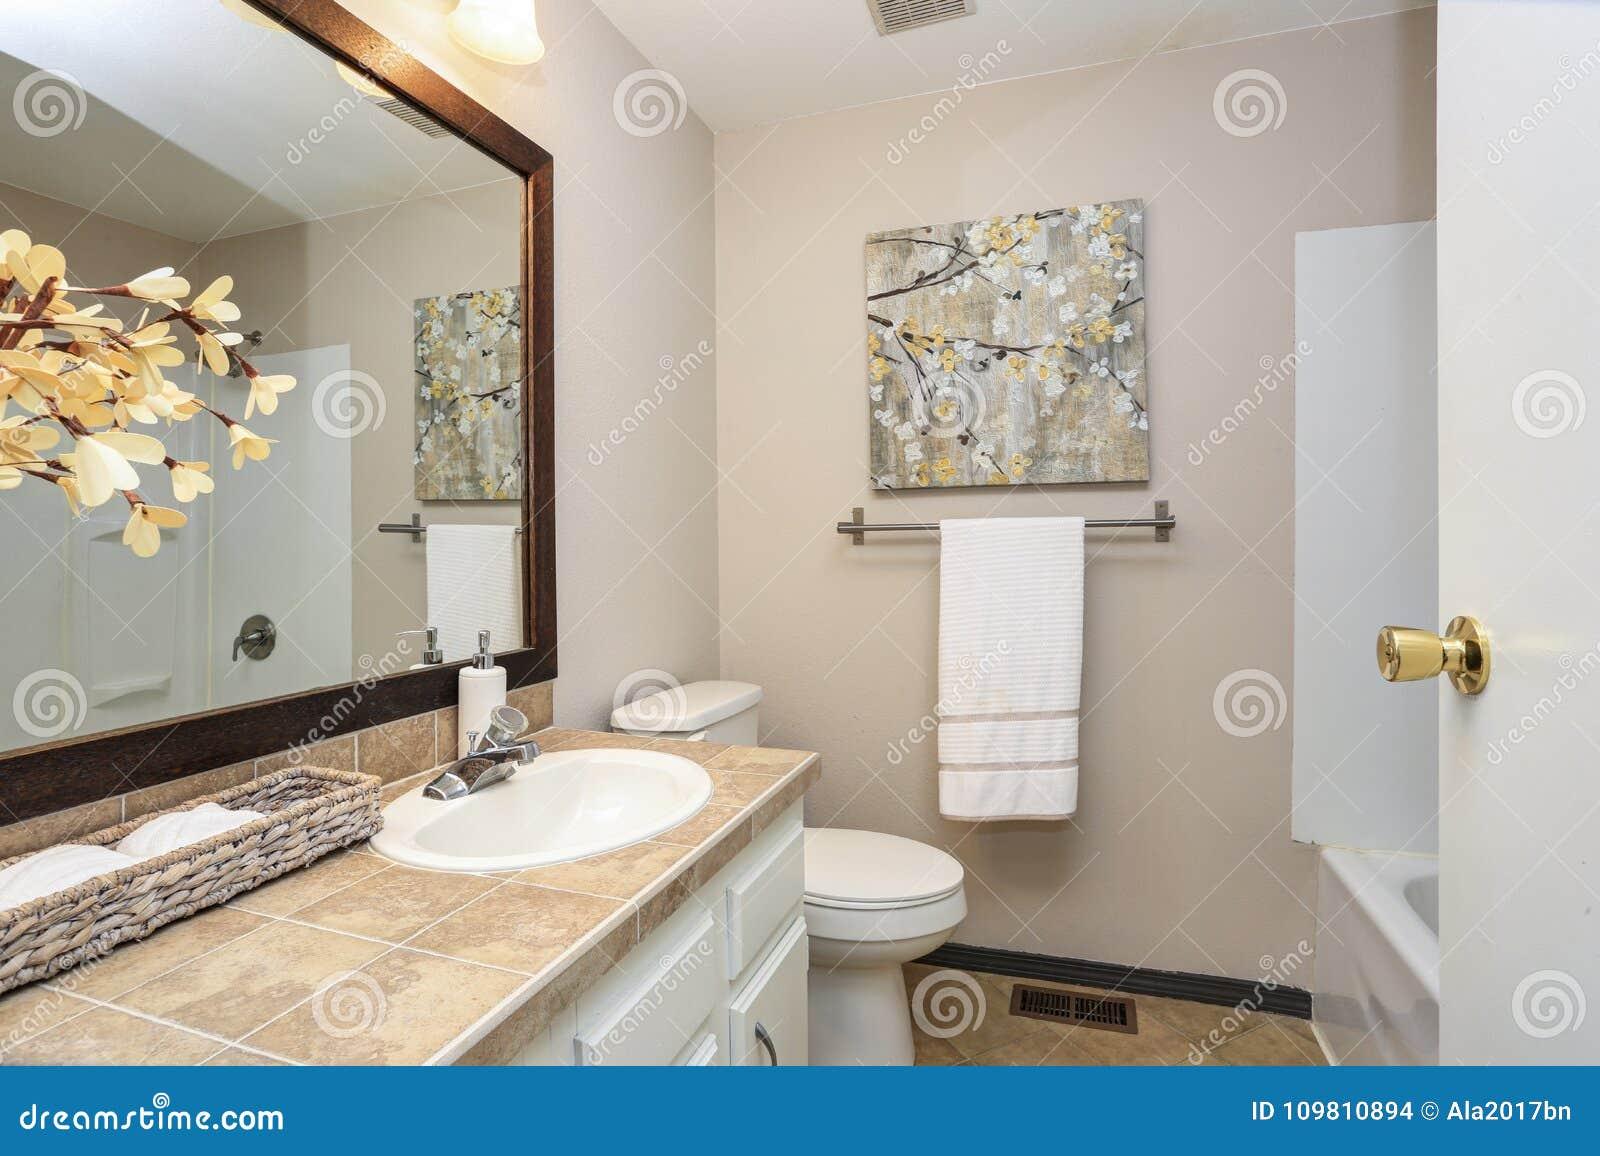 Creamy White Bathroom Boasts A Vanity Stock Photo - Image of idea ...